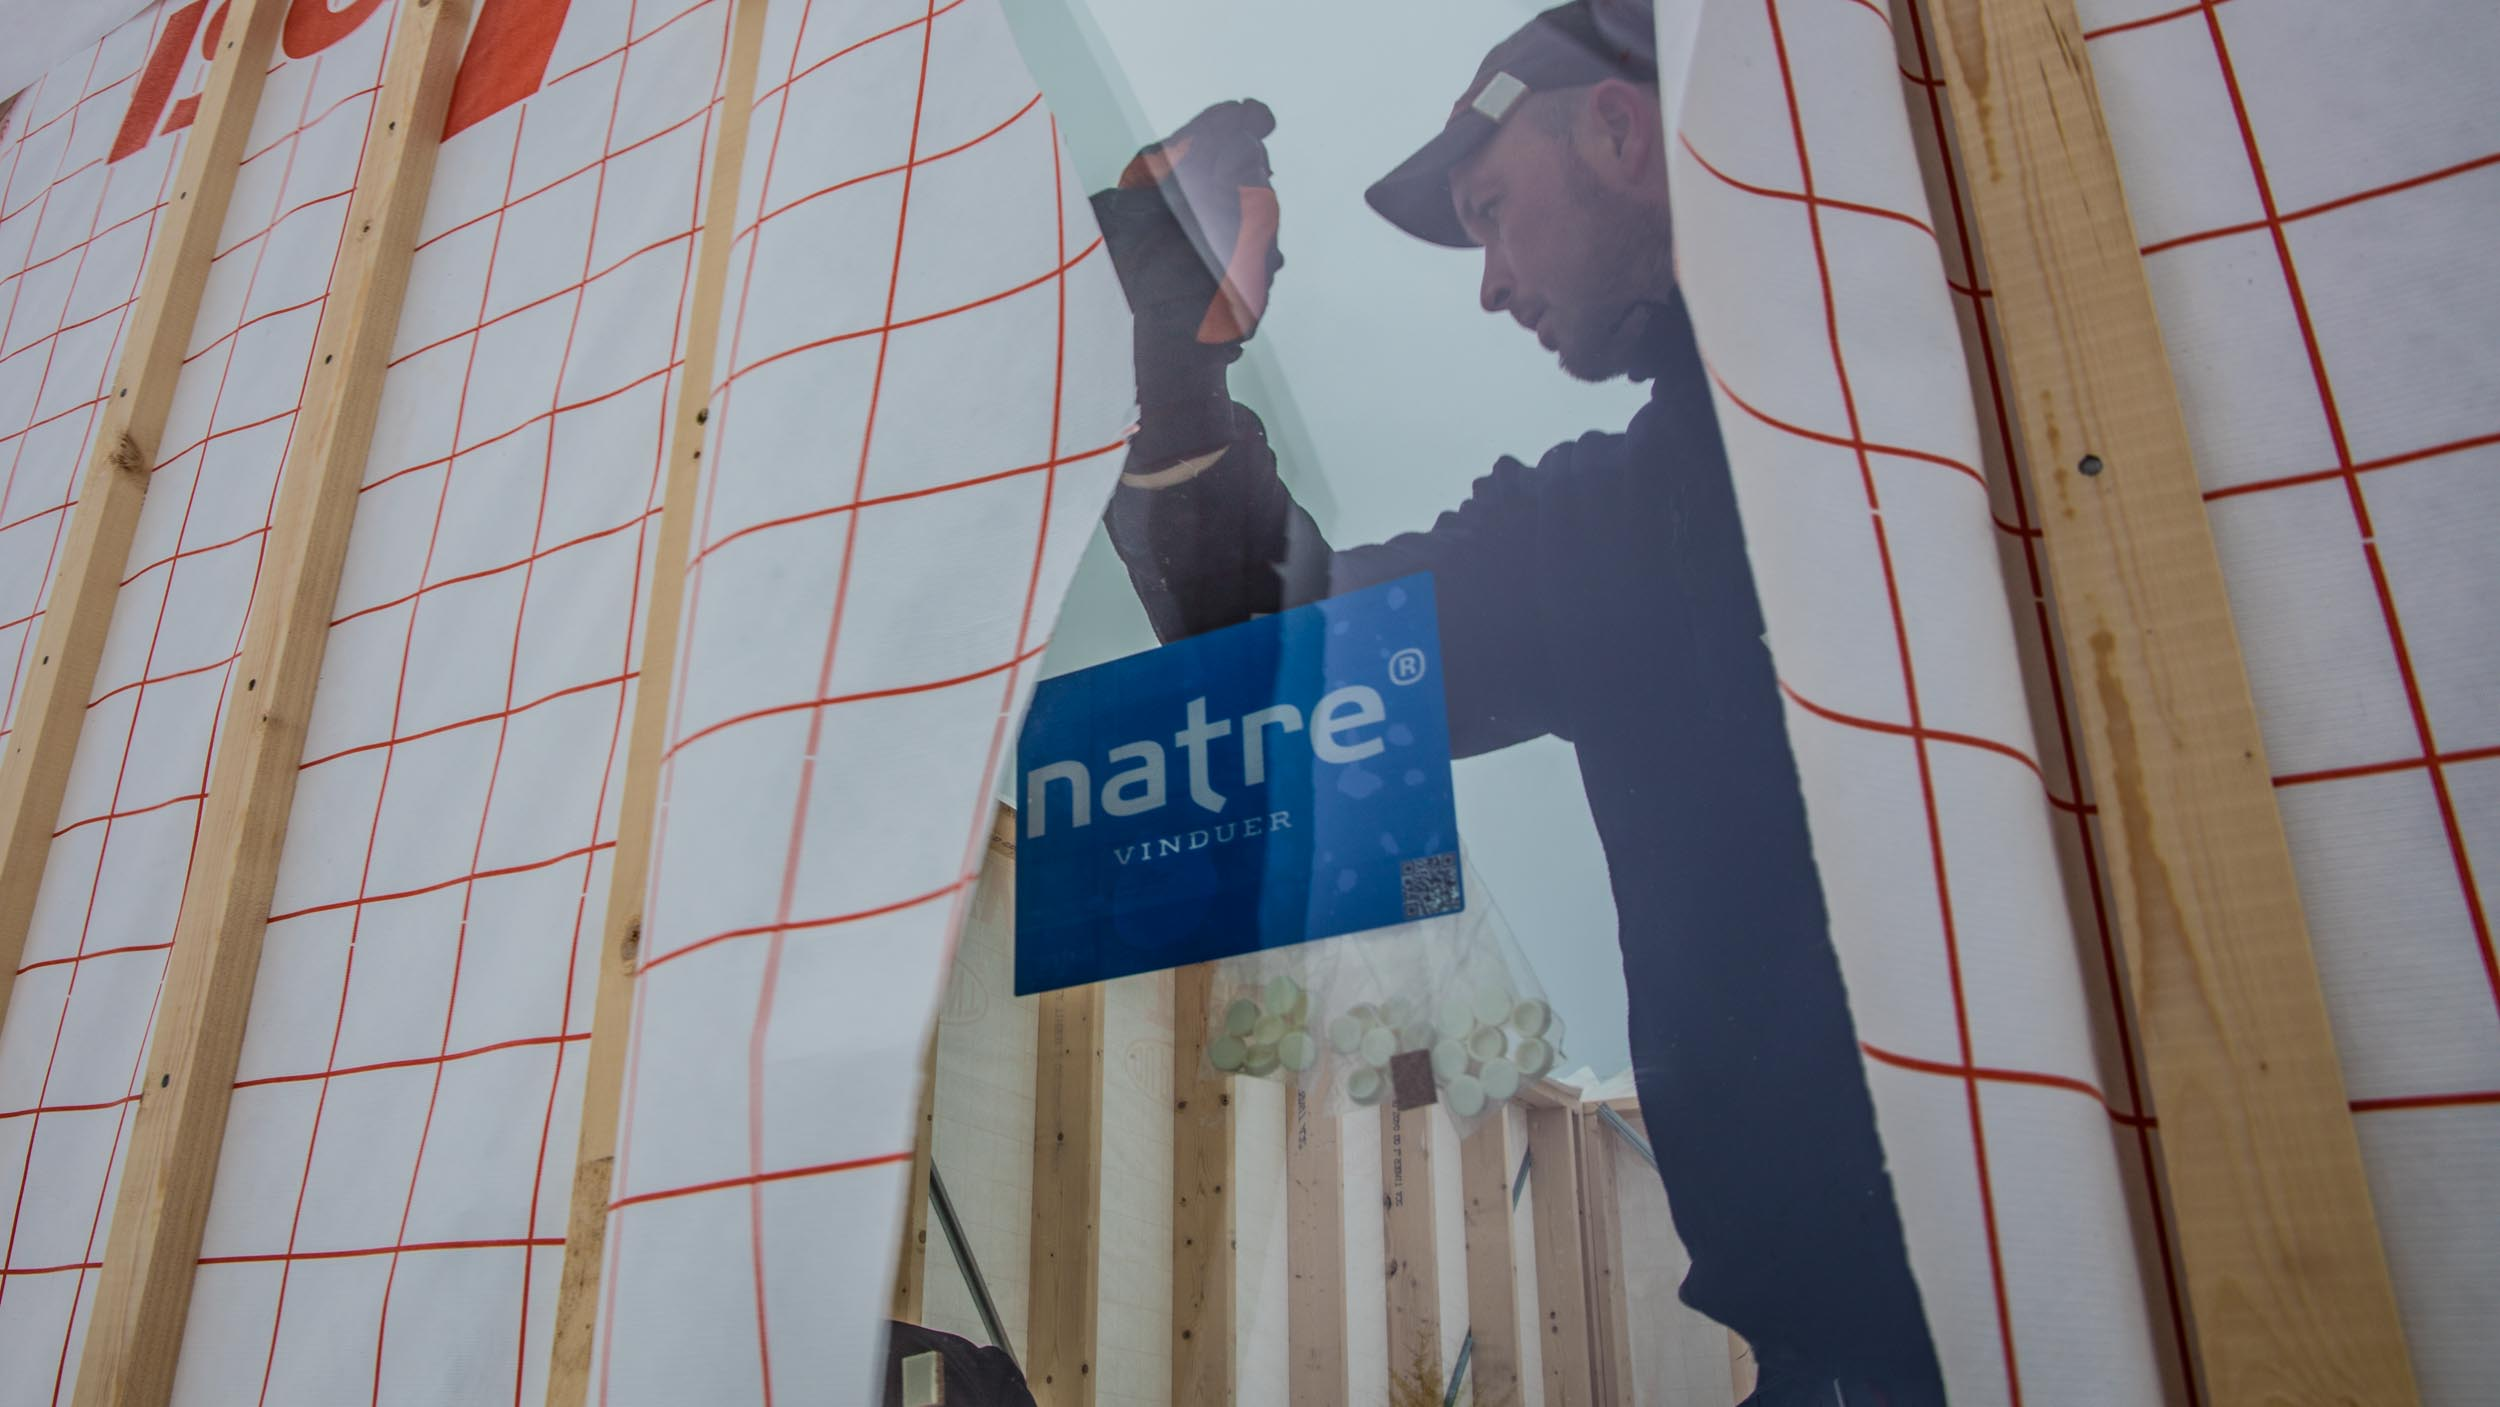 NATRE HOVED-3668.jpg